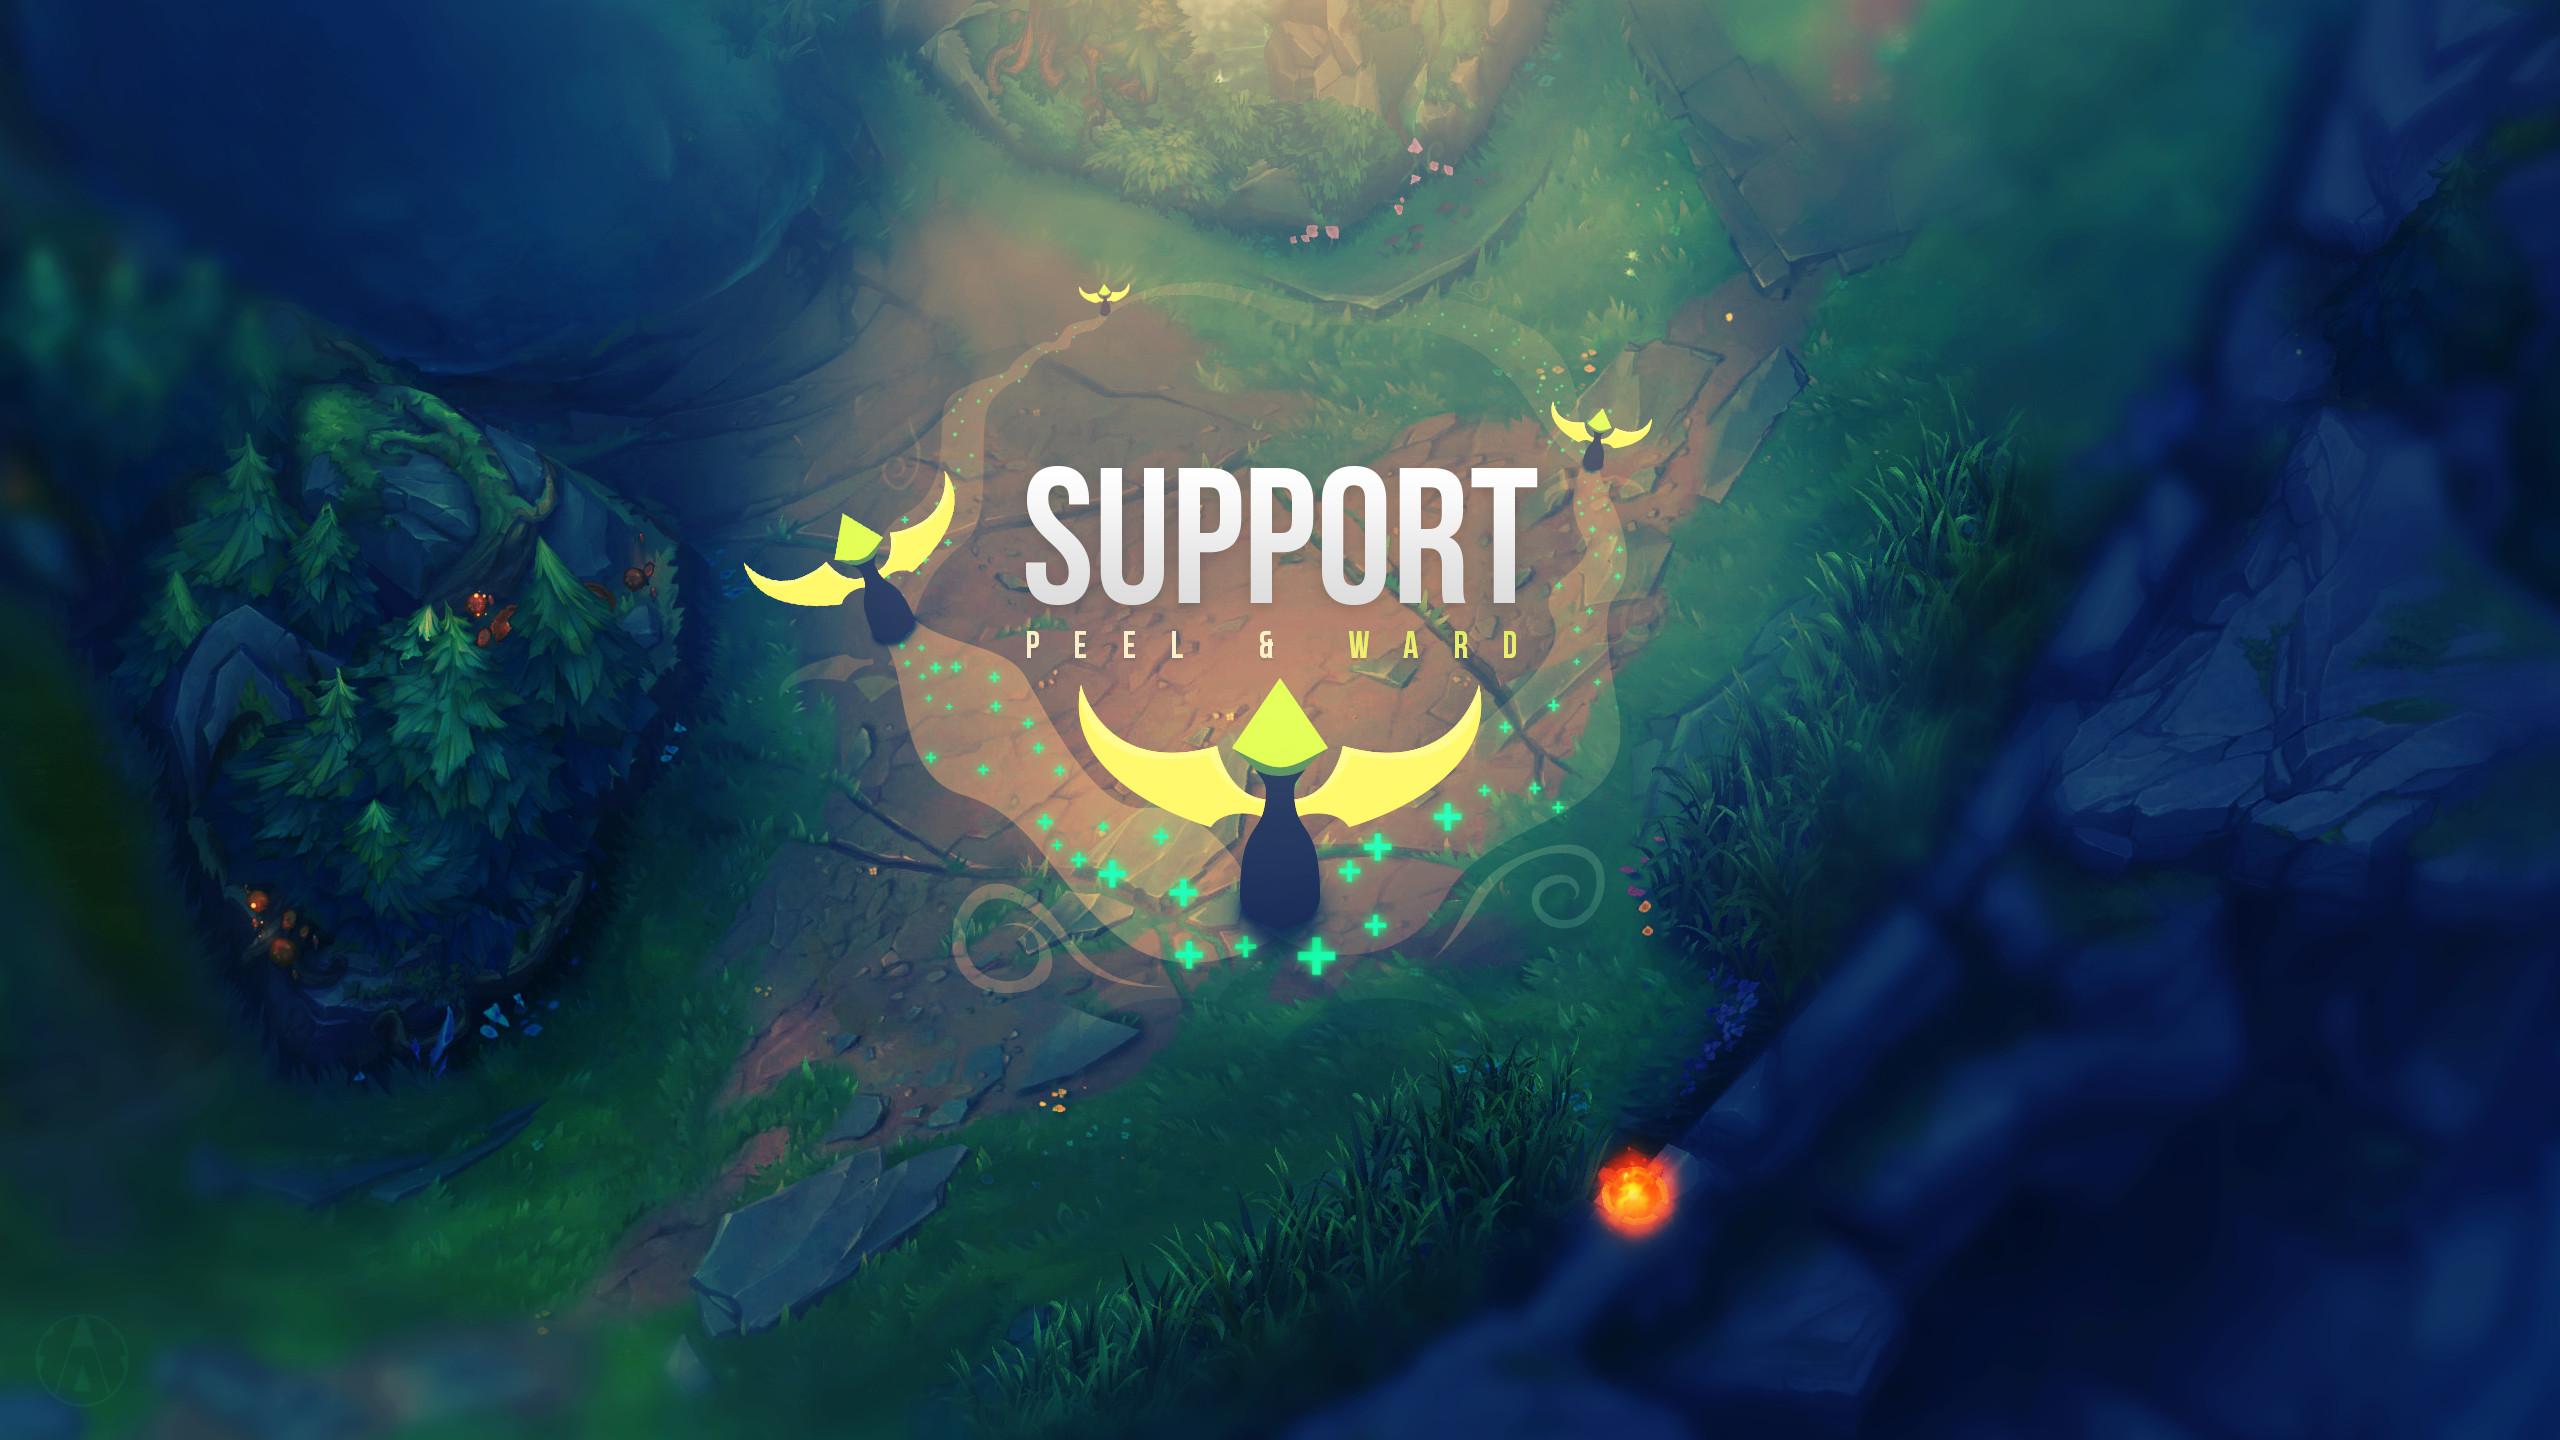 Support Wallpaper + album – League of Legends by Aynoe on DeviantArt